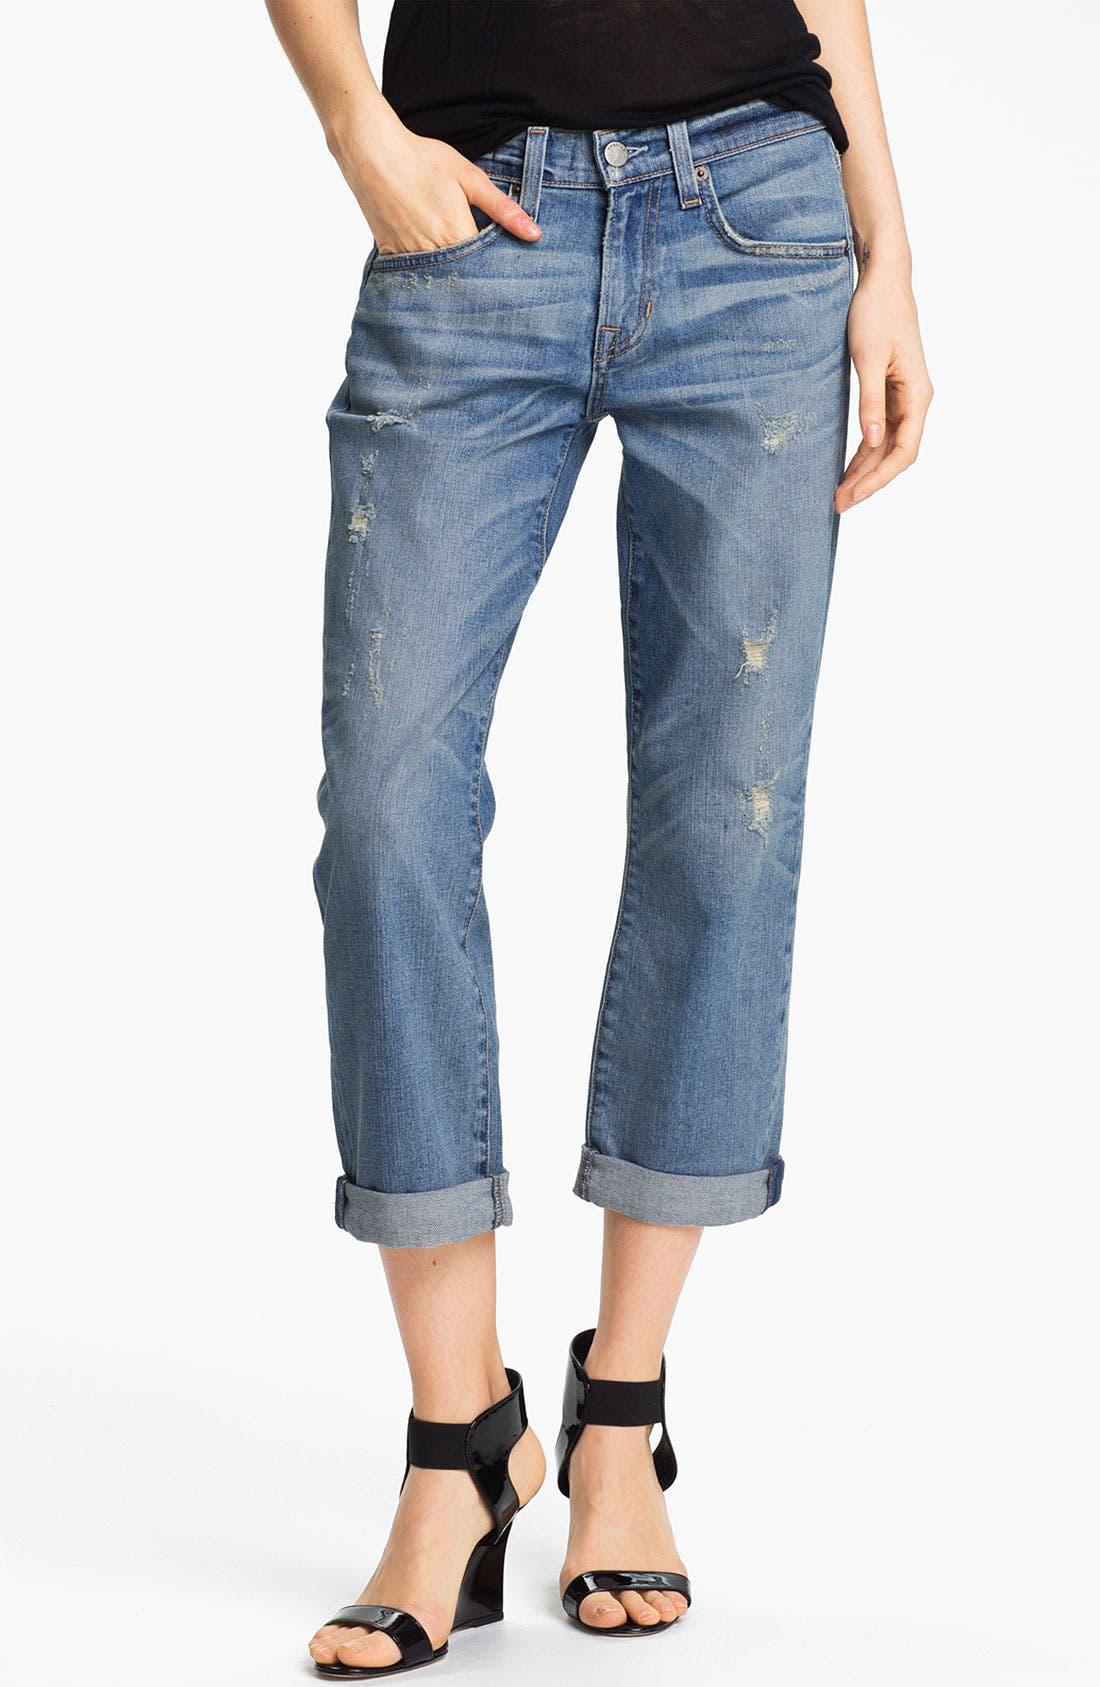 Alternate Image 1 Selected - TEXTILE Elizabeth and James 'Bennett' Boyfriend Jeans